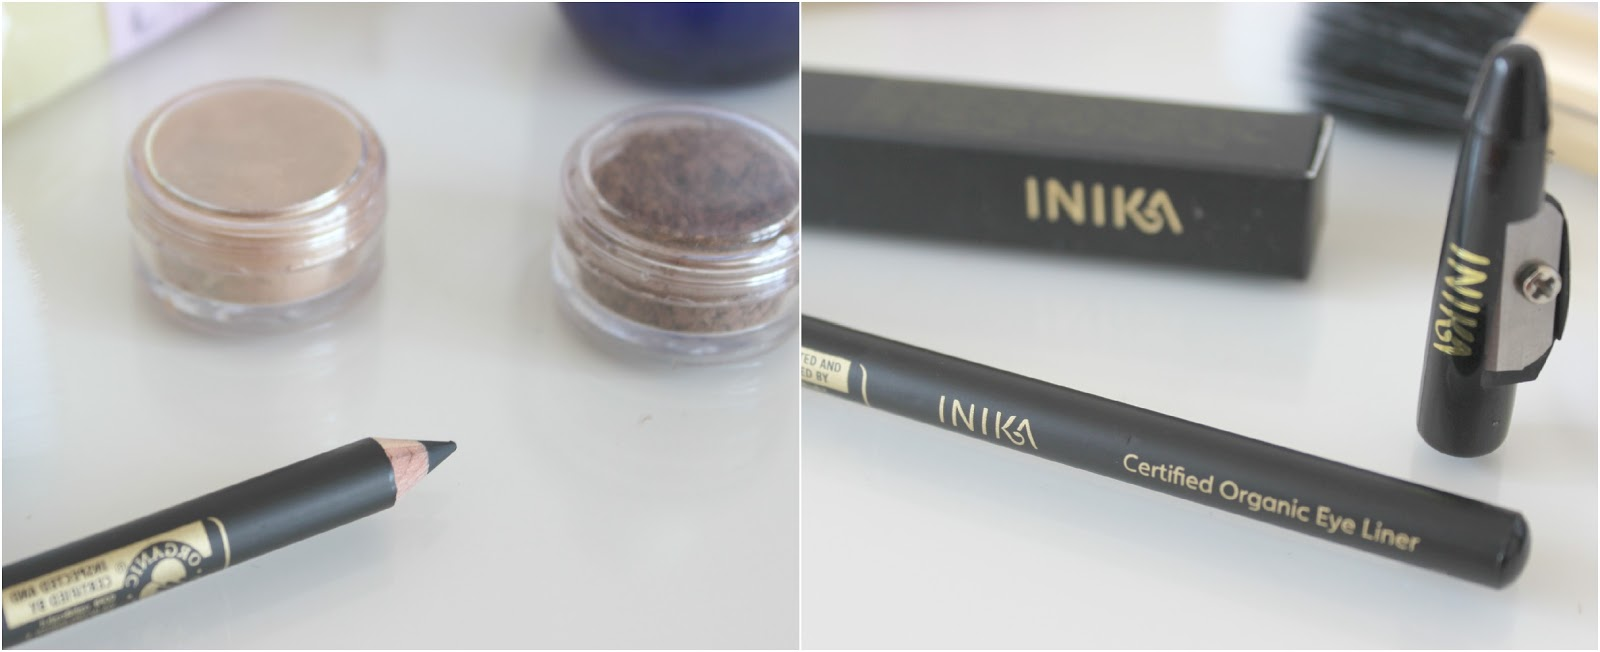 A picture of vegan friendly Inika Black Caviar Eyeliner